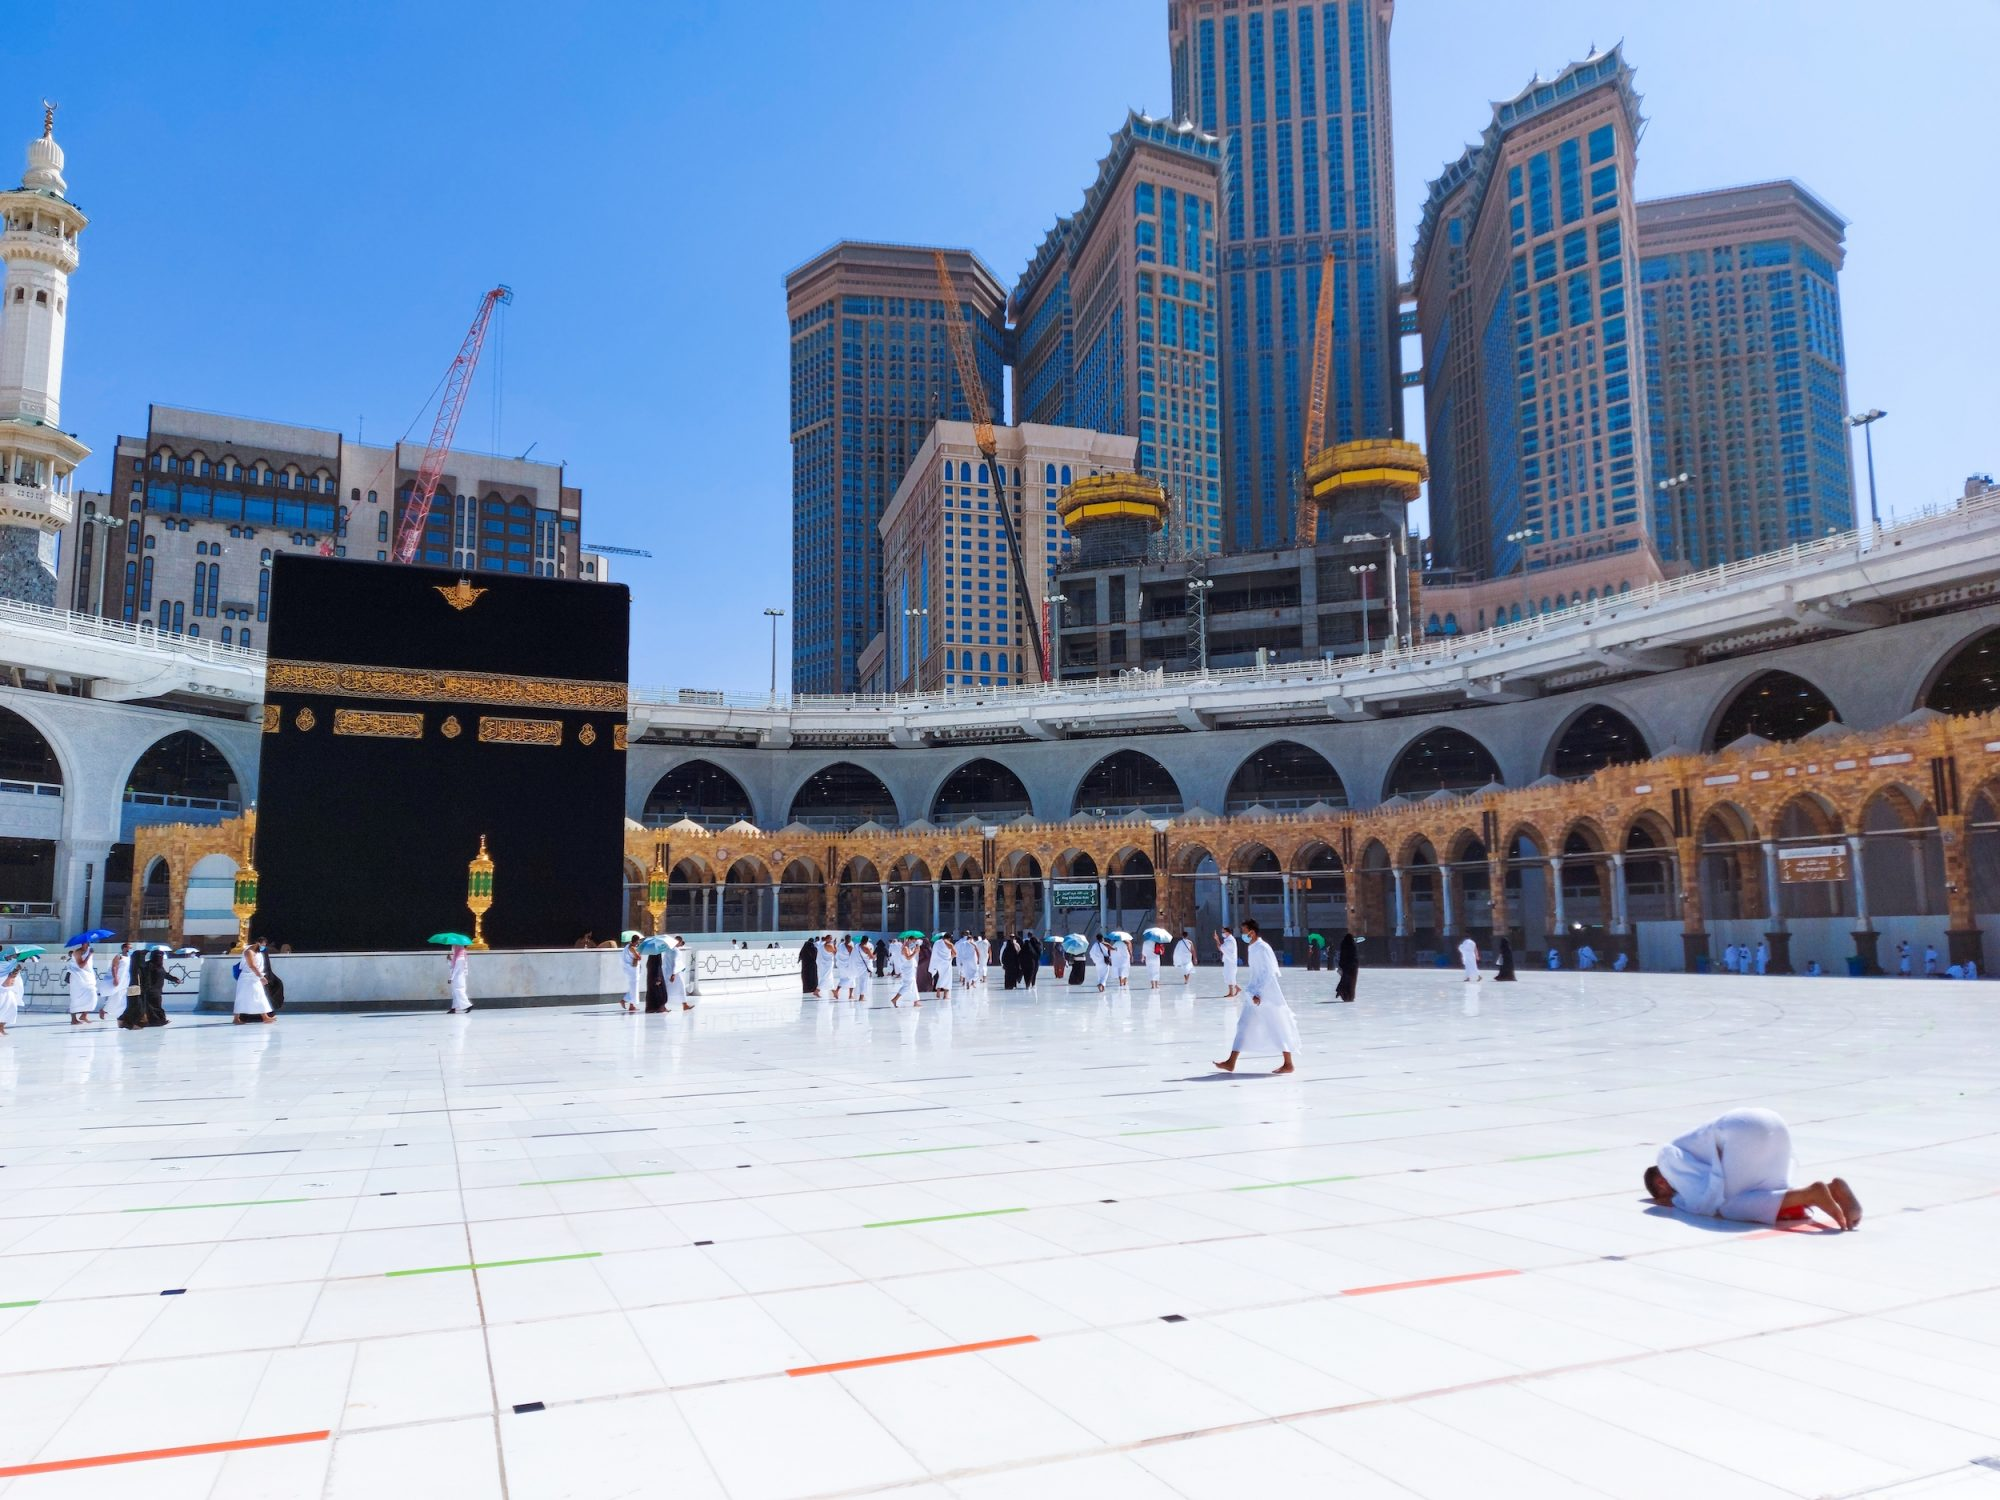 Saudi Arabia: 10,000 riyals fine for performing umrah without permission during Ramadan